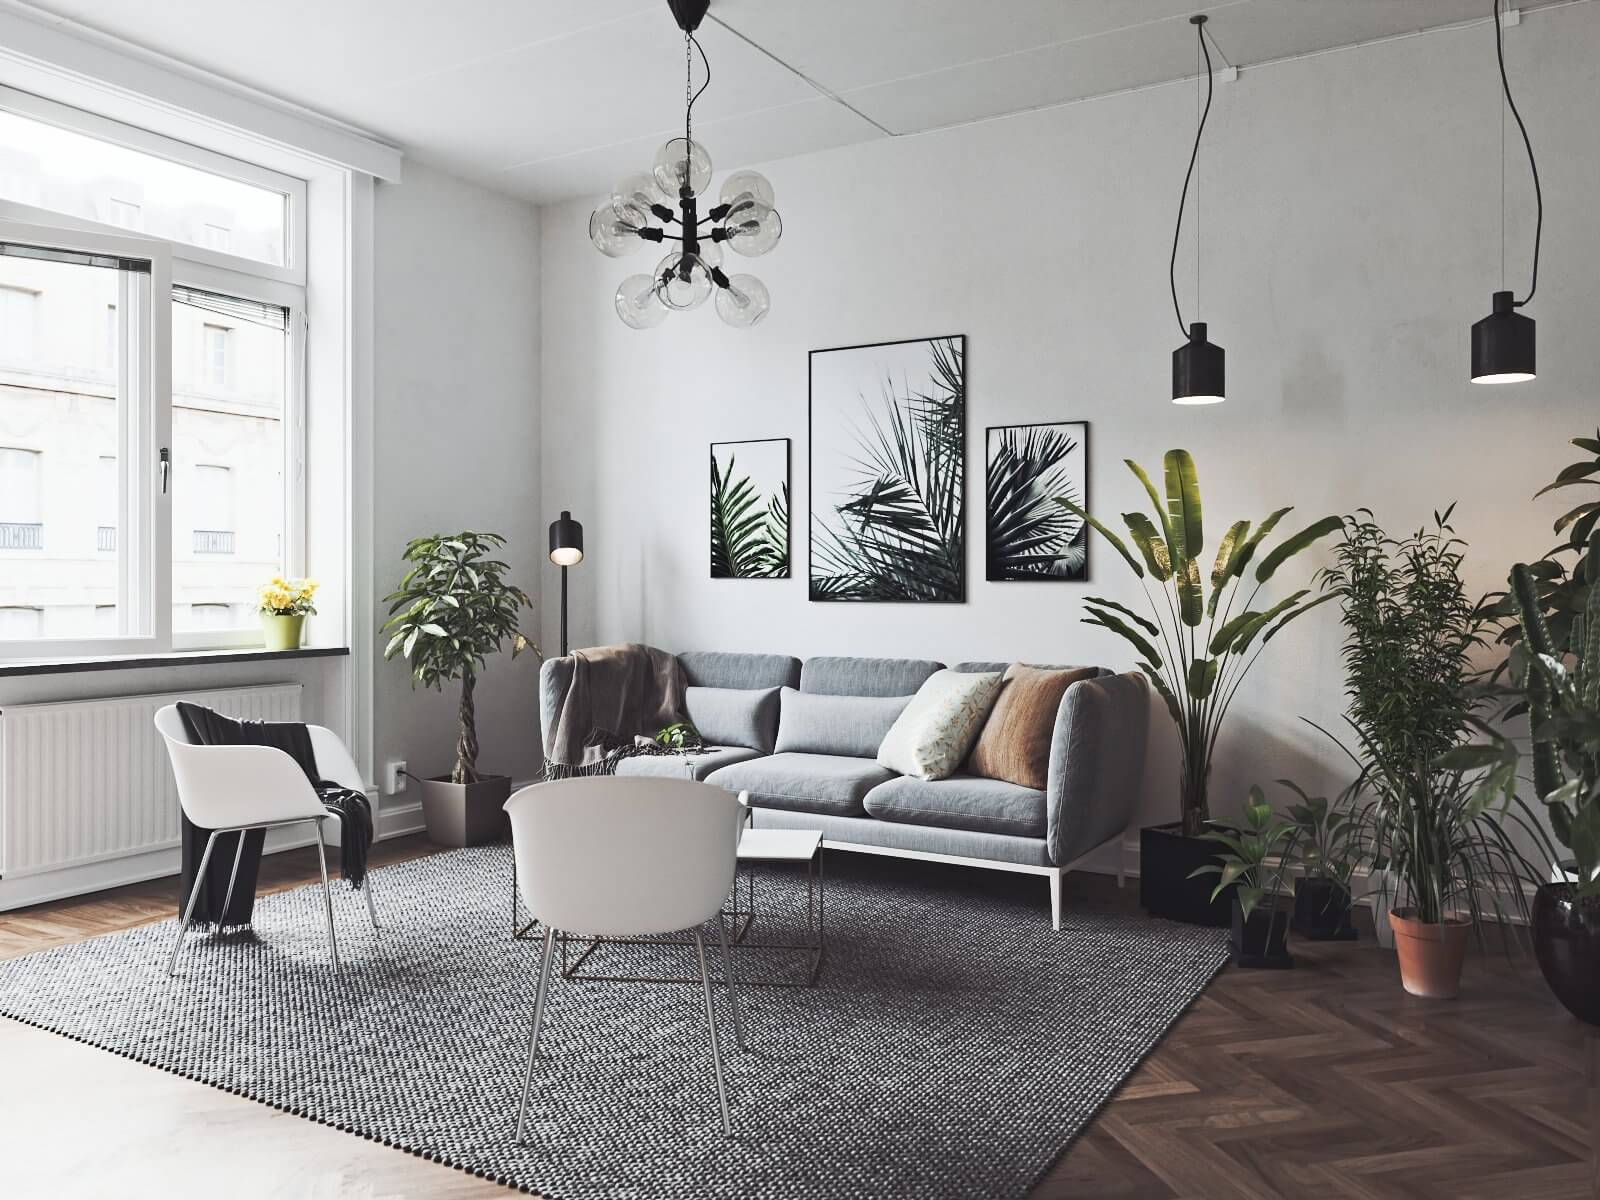 Scandinavian flat living room 2 - cgi visualization